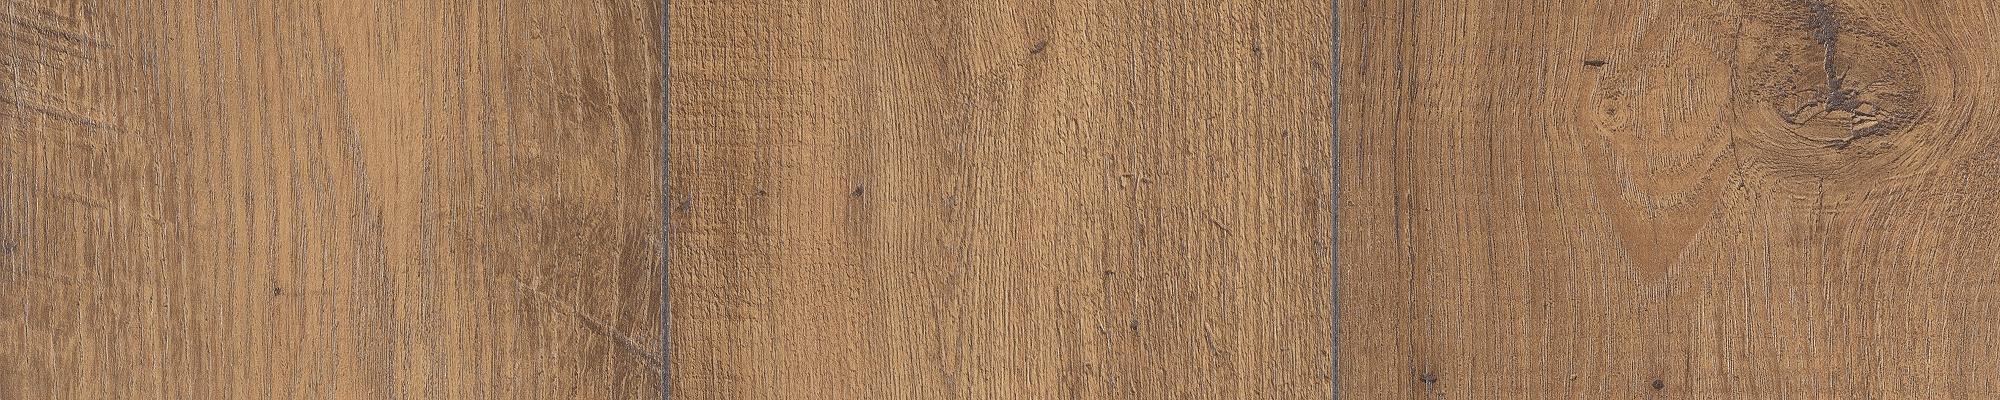 Rare Vintage Fawn Chestnut Laminate, Mohawk Cortland Laminate Flooring